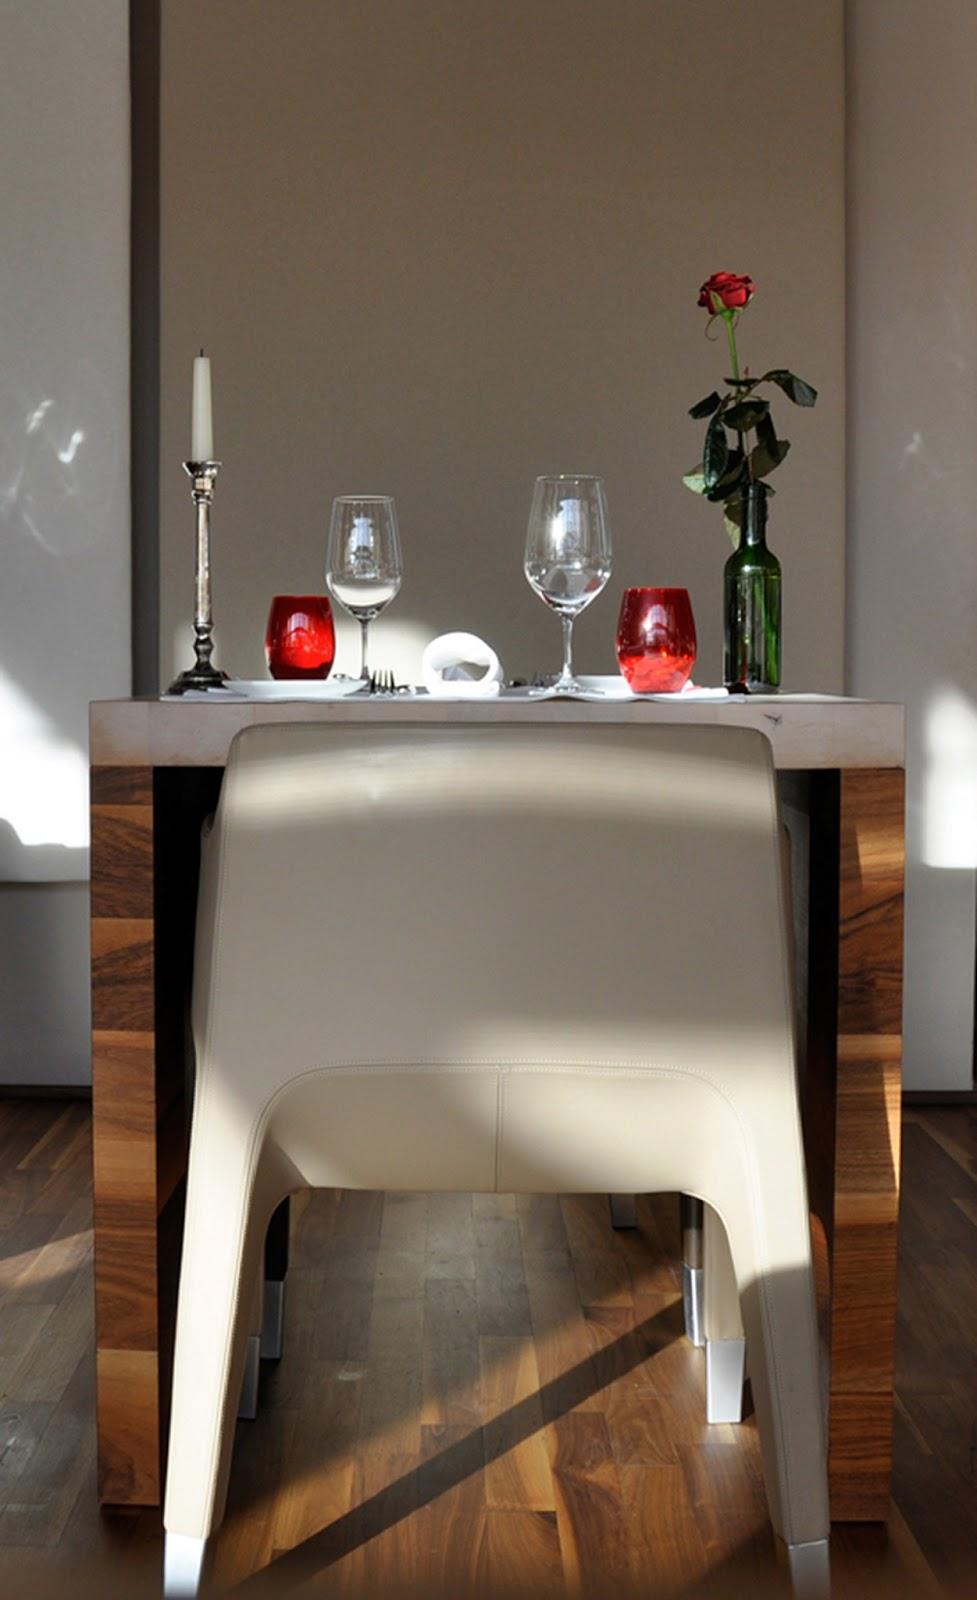 Italien ko reisen umweltfreundlich italien feldmilla for Design hotel dolomiten italien